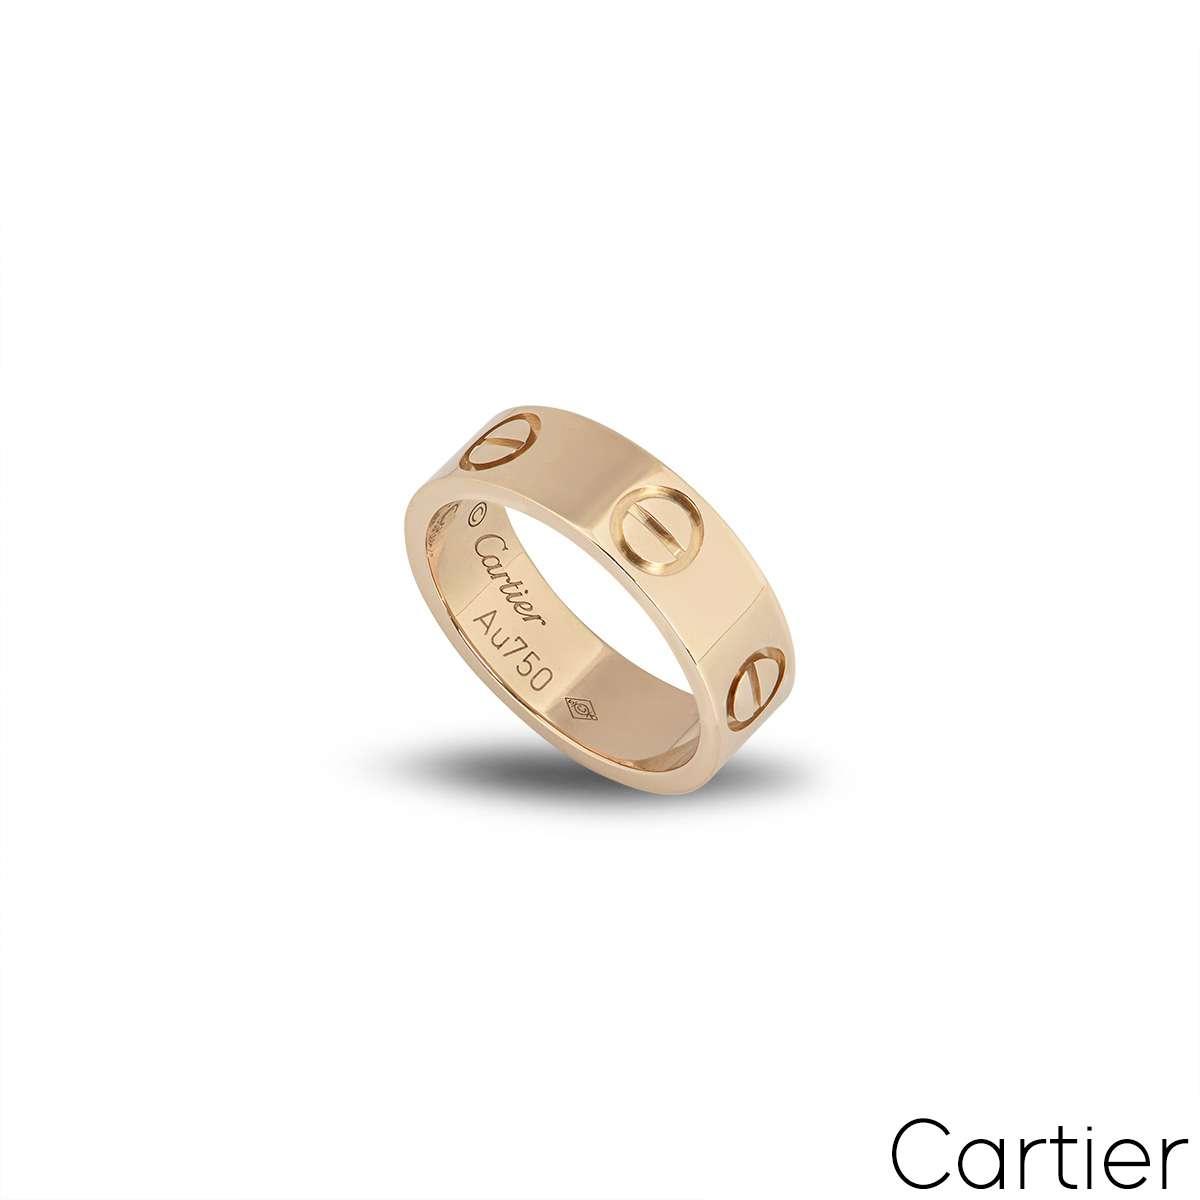 Cartier Rose Gold Plain Love Ring Size 48 B4084800